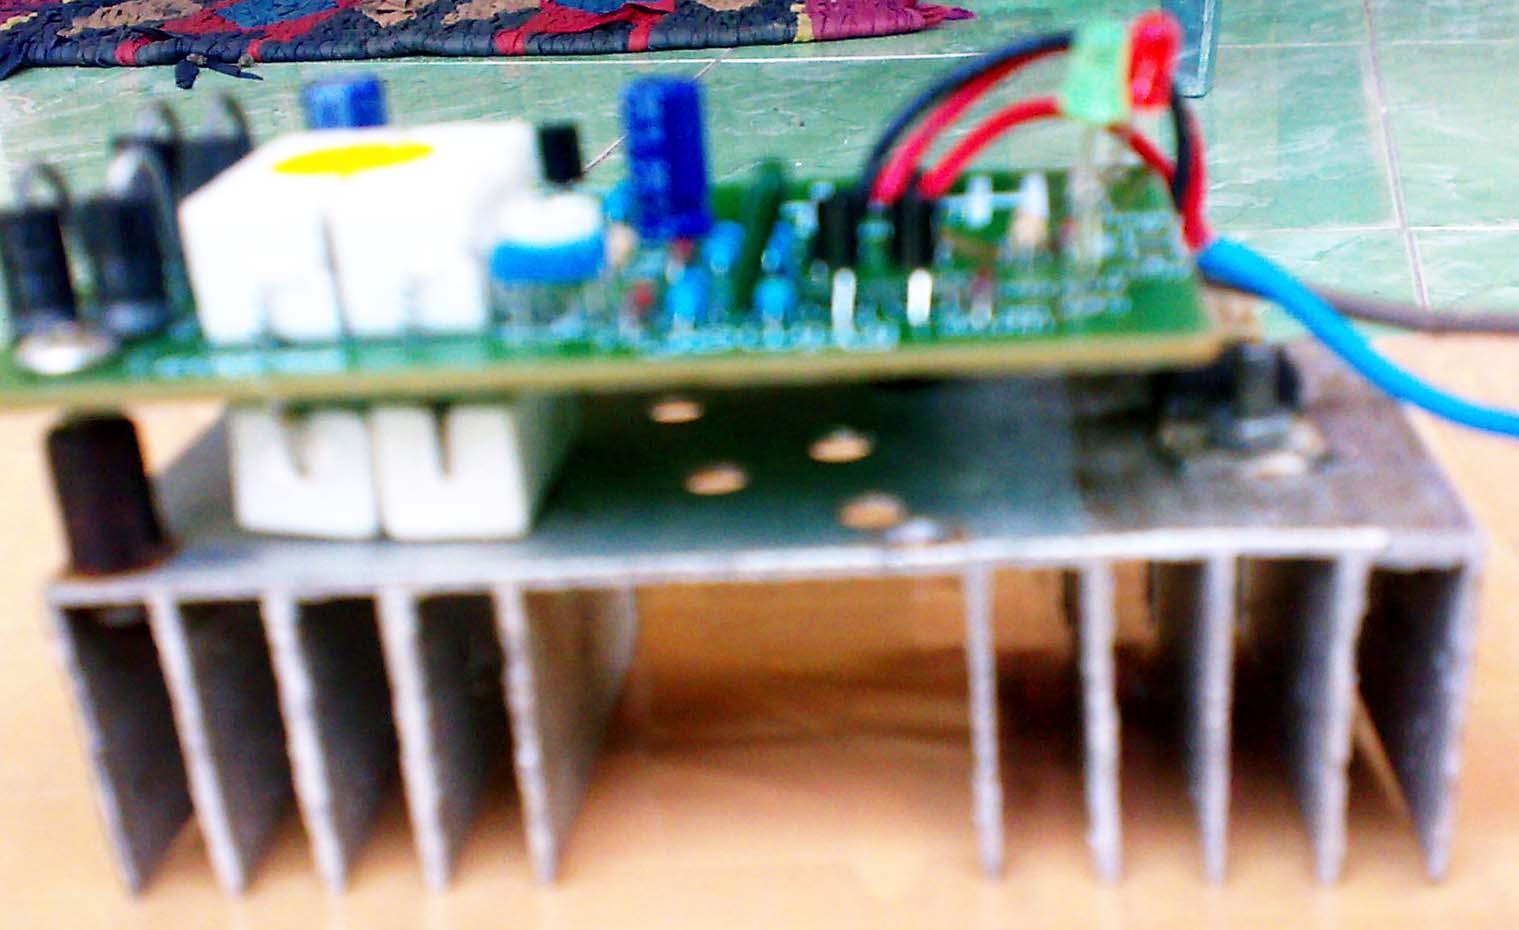 Cara Memodifikasi Kit Charger Aki Otomatis Usaha Dari Hobi Accu 12v Automatic O Cas Artikel Terkait Jual Controller Panel Surya